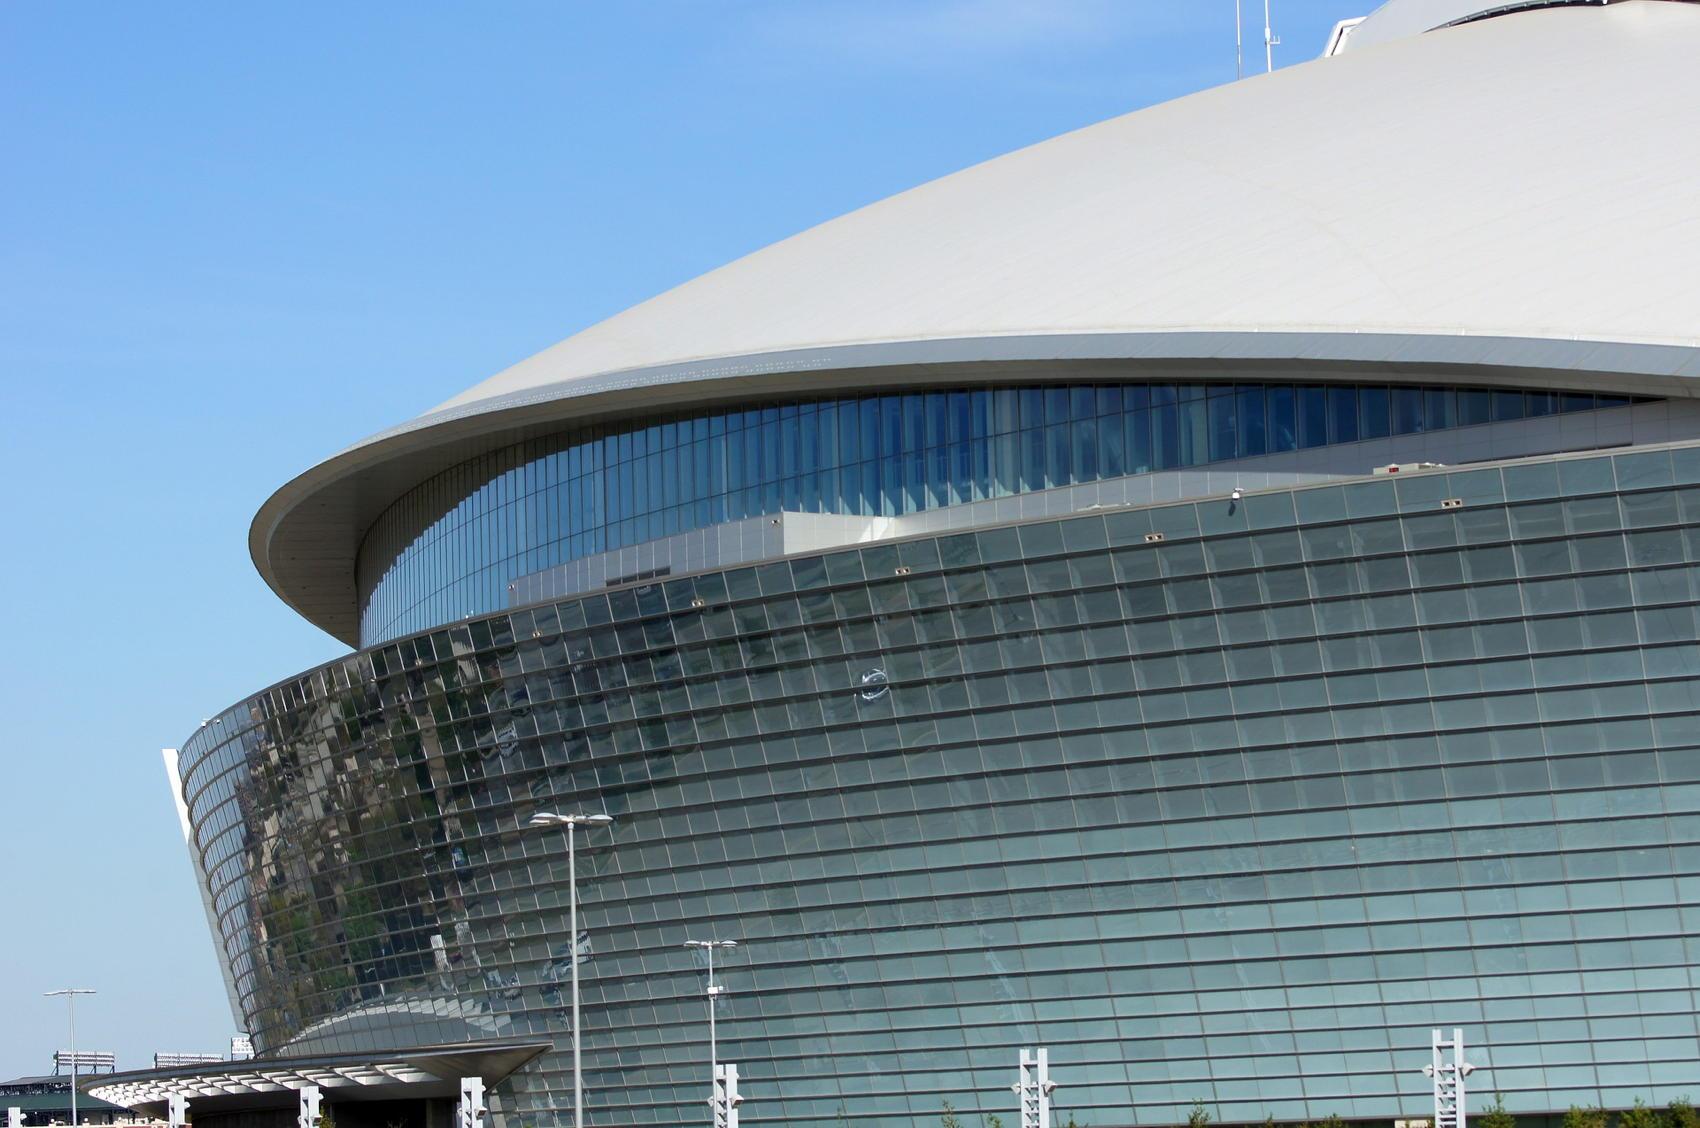 Dallas Stadium - Image by nancyenidd